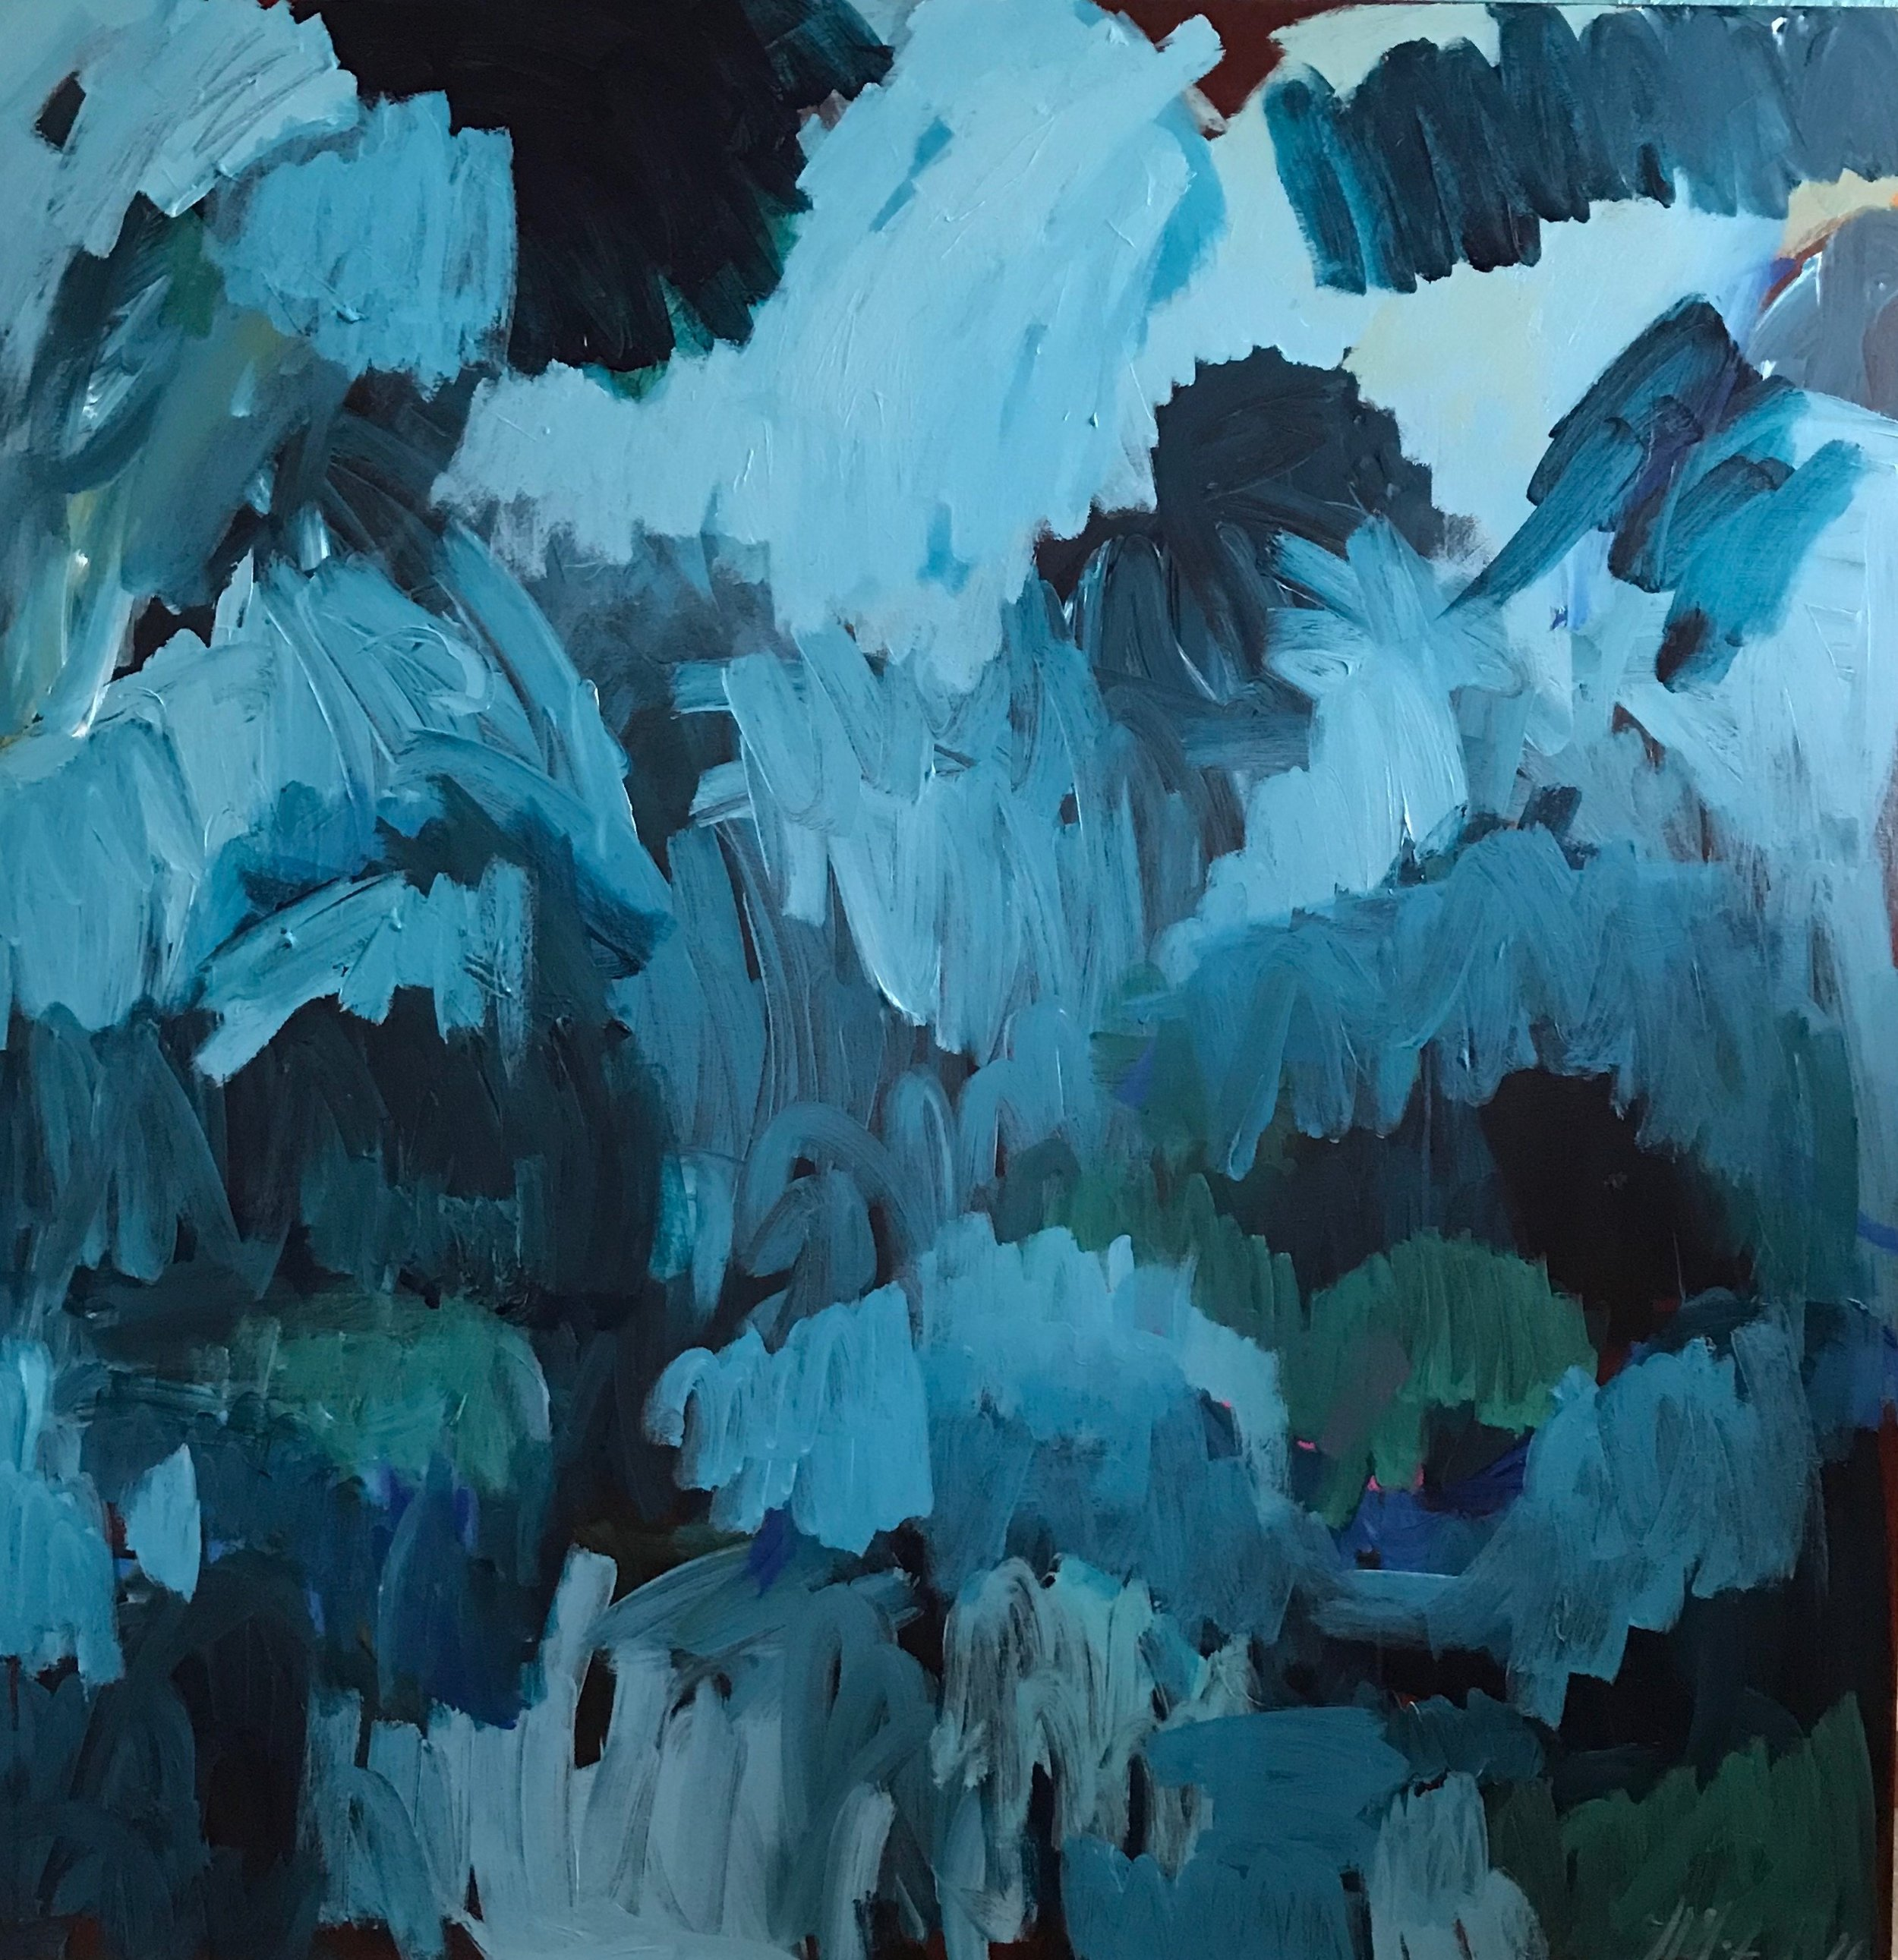 HIDDEN PLEASURES by Myra Mitchell